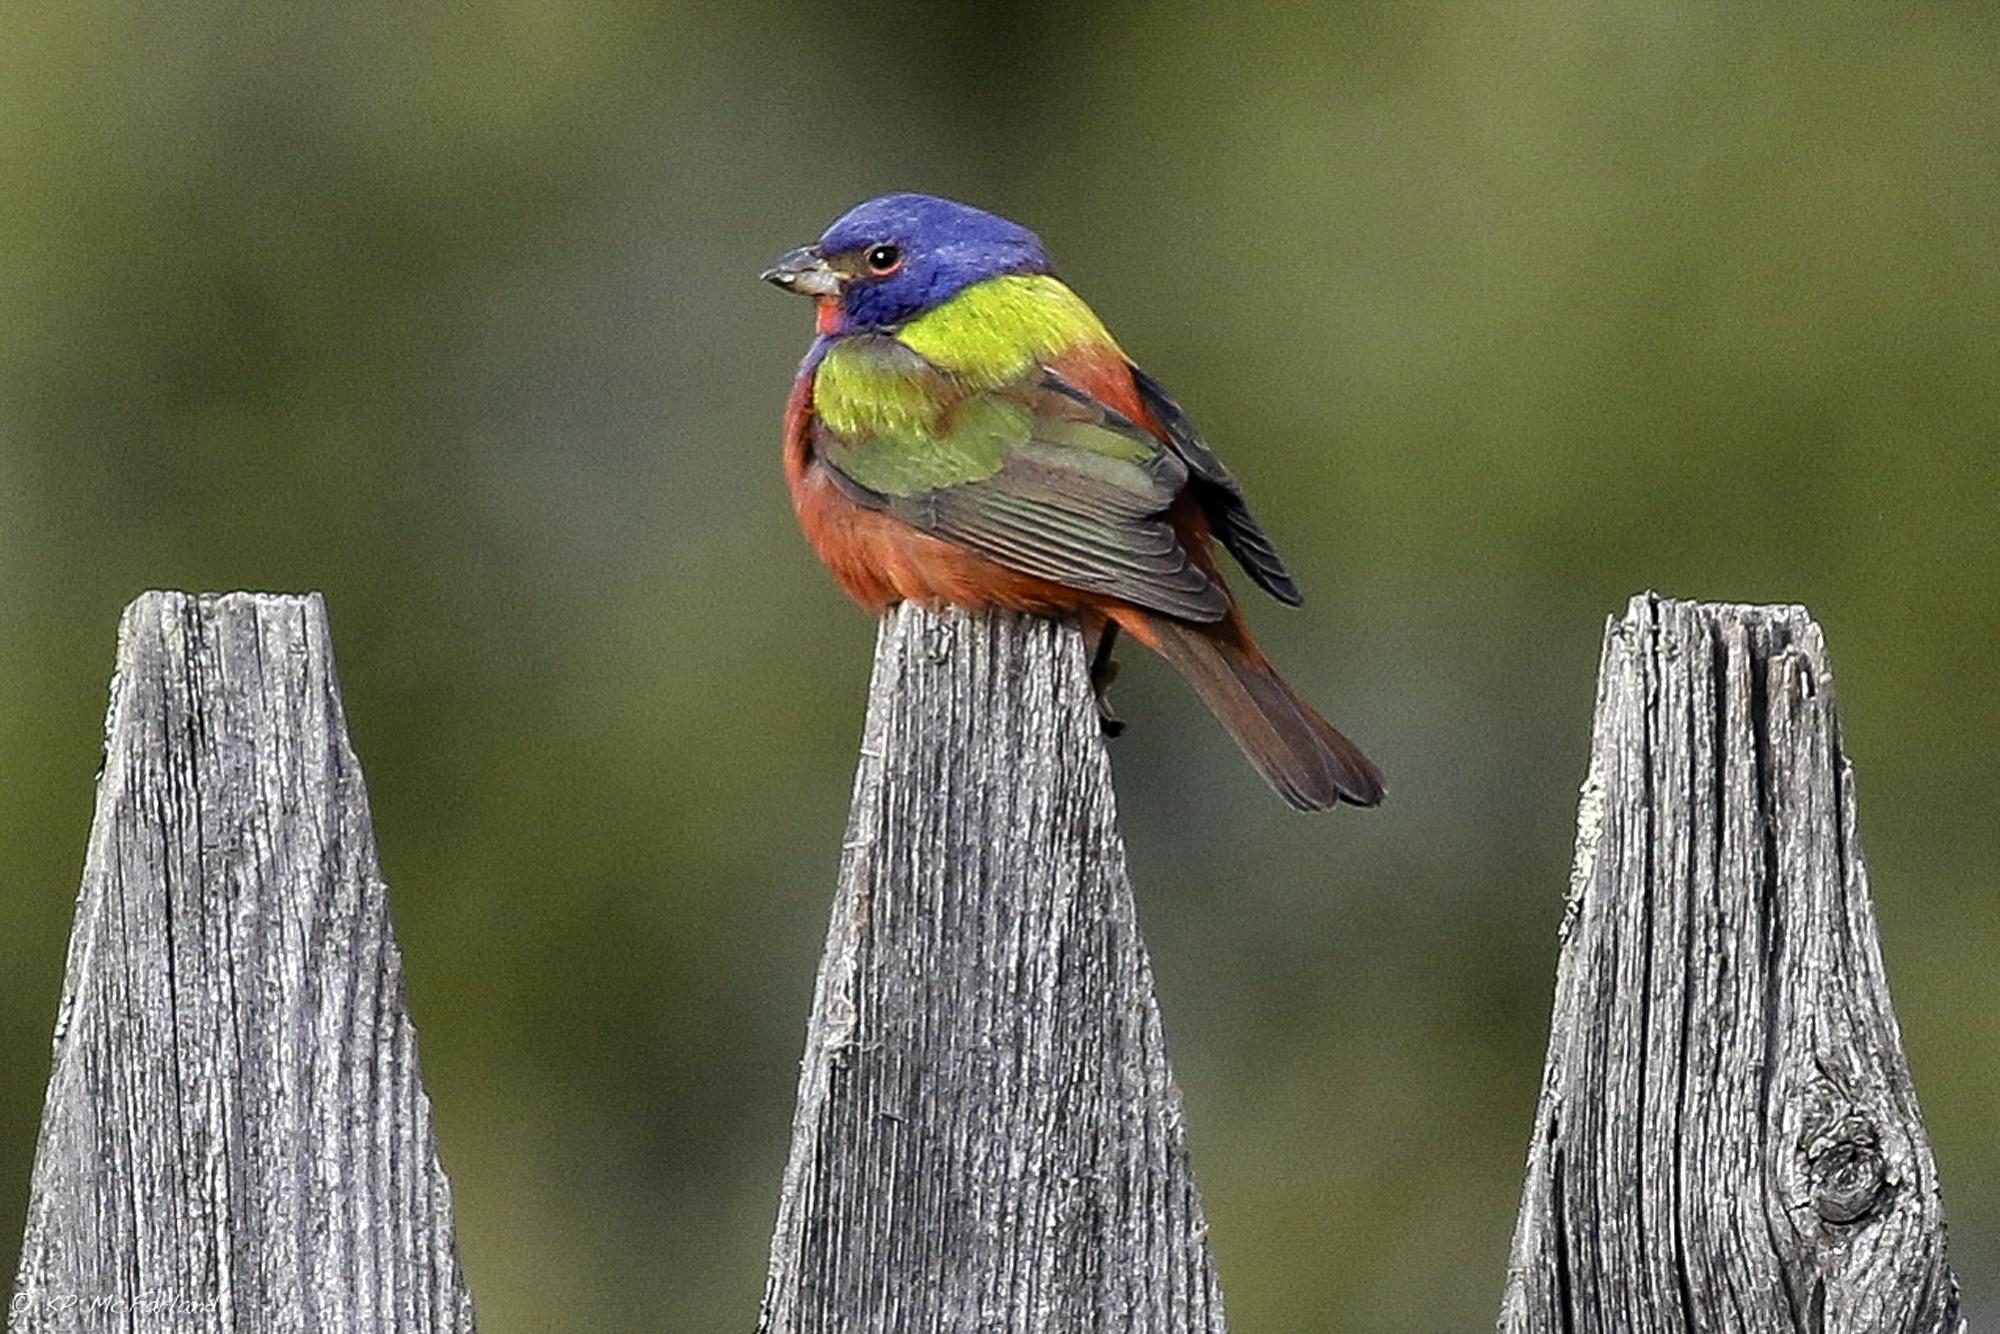 bird watchers flock to vermont for glimpse of rainbow colored bird cbs news. Black Bedroom Furniture Sets. Home Design Ideas